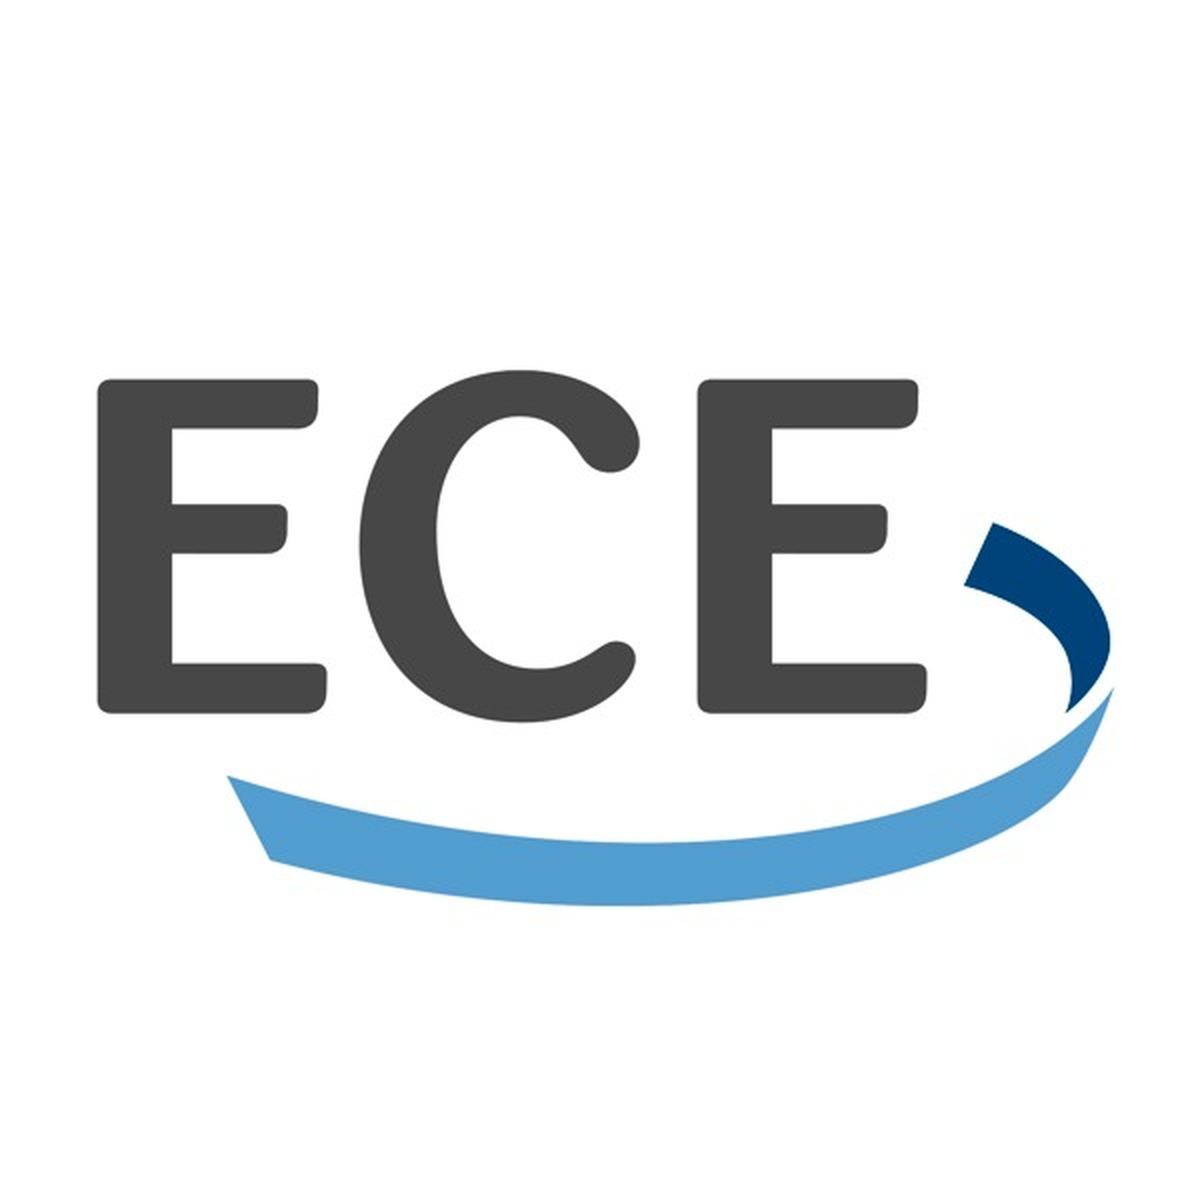 Online Marketing Manager (m/w/d) - Shopmanagement im Ecommerce